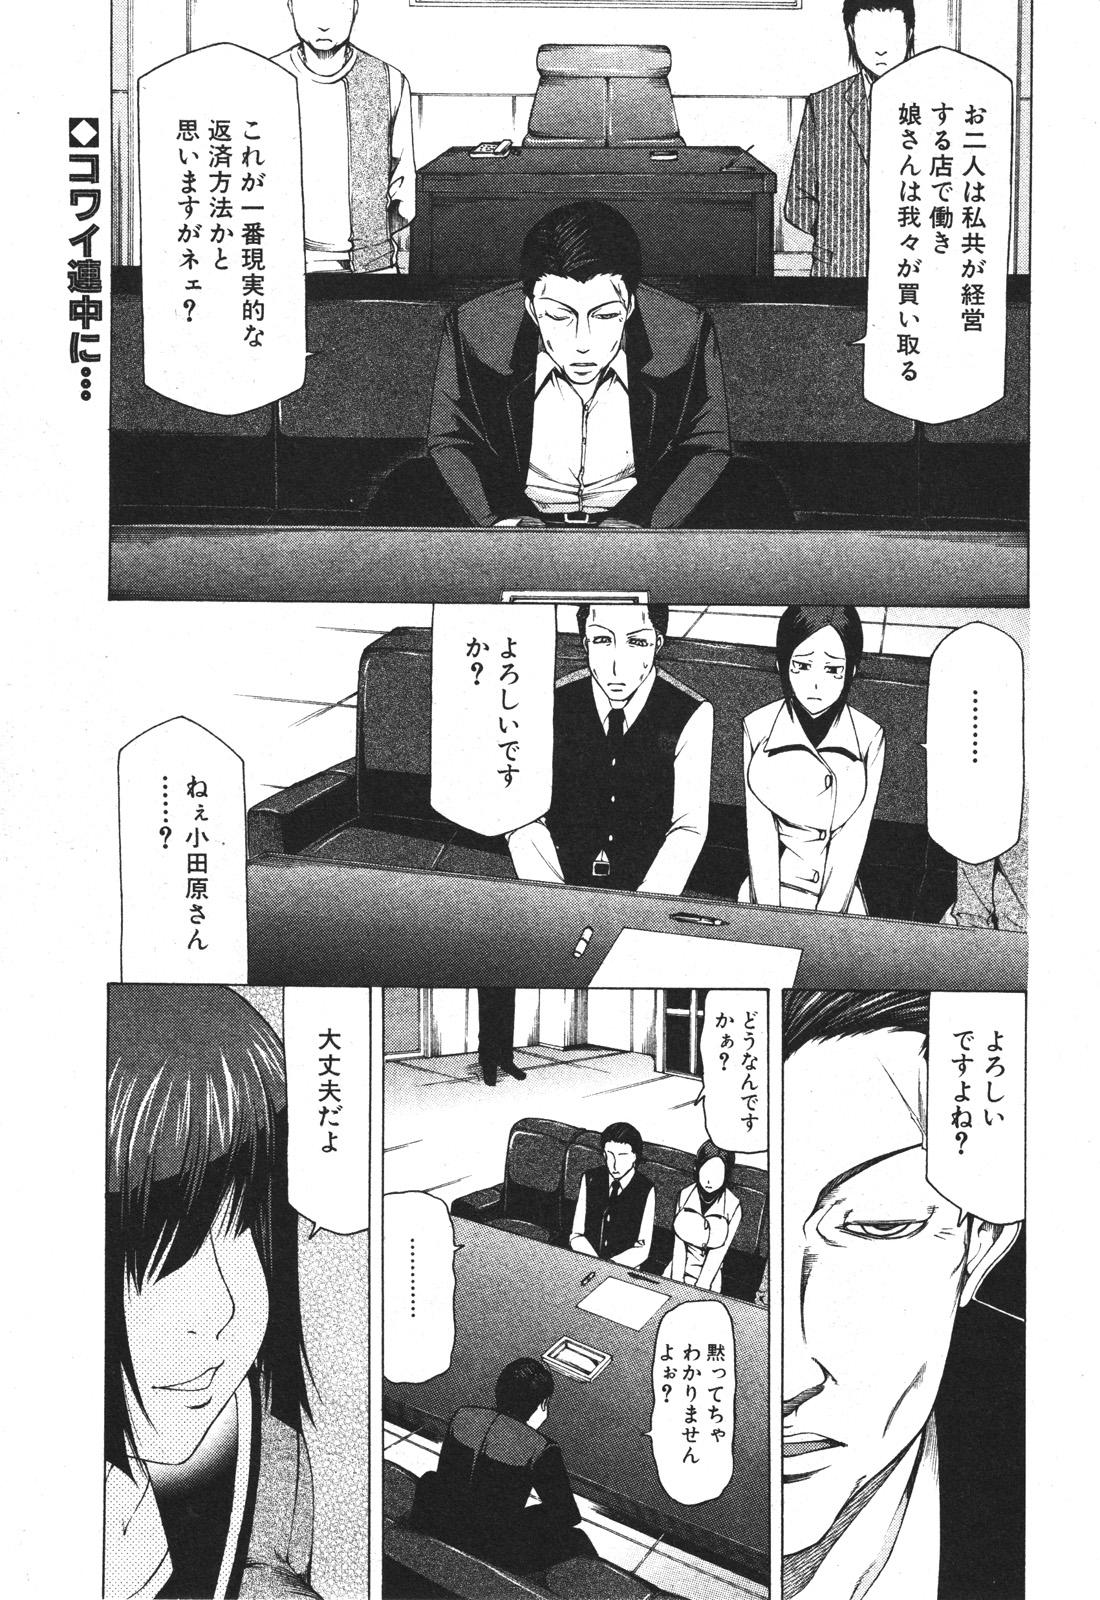 BUSTER COMIC 2010-05 Vol.07 317